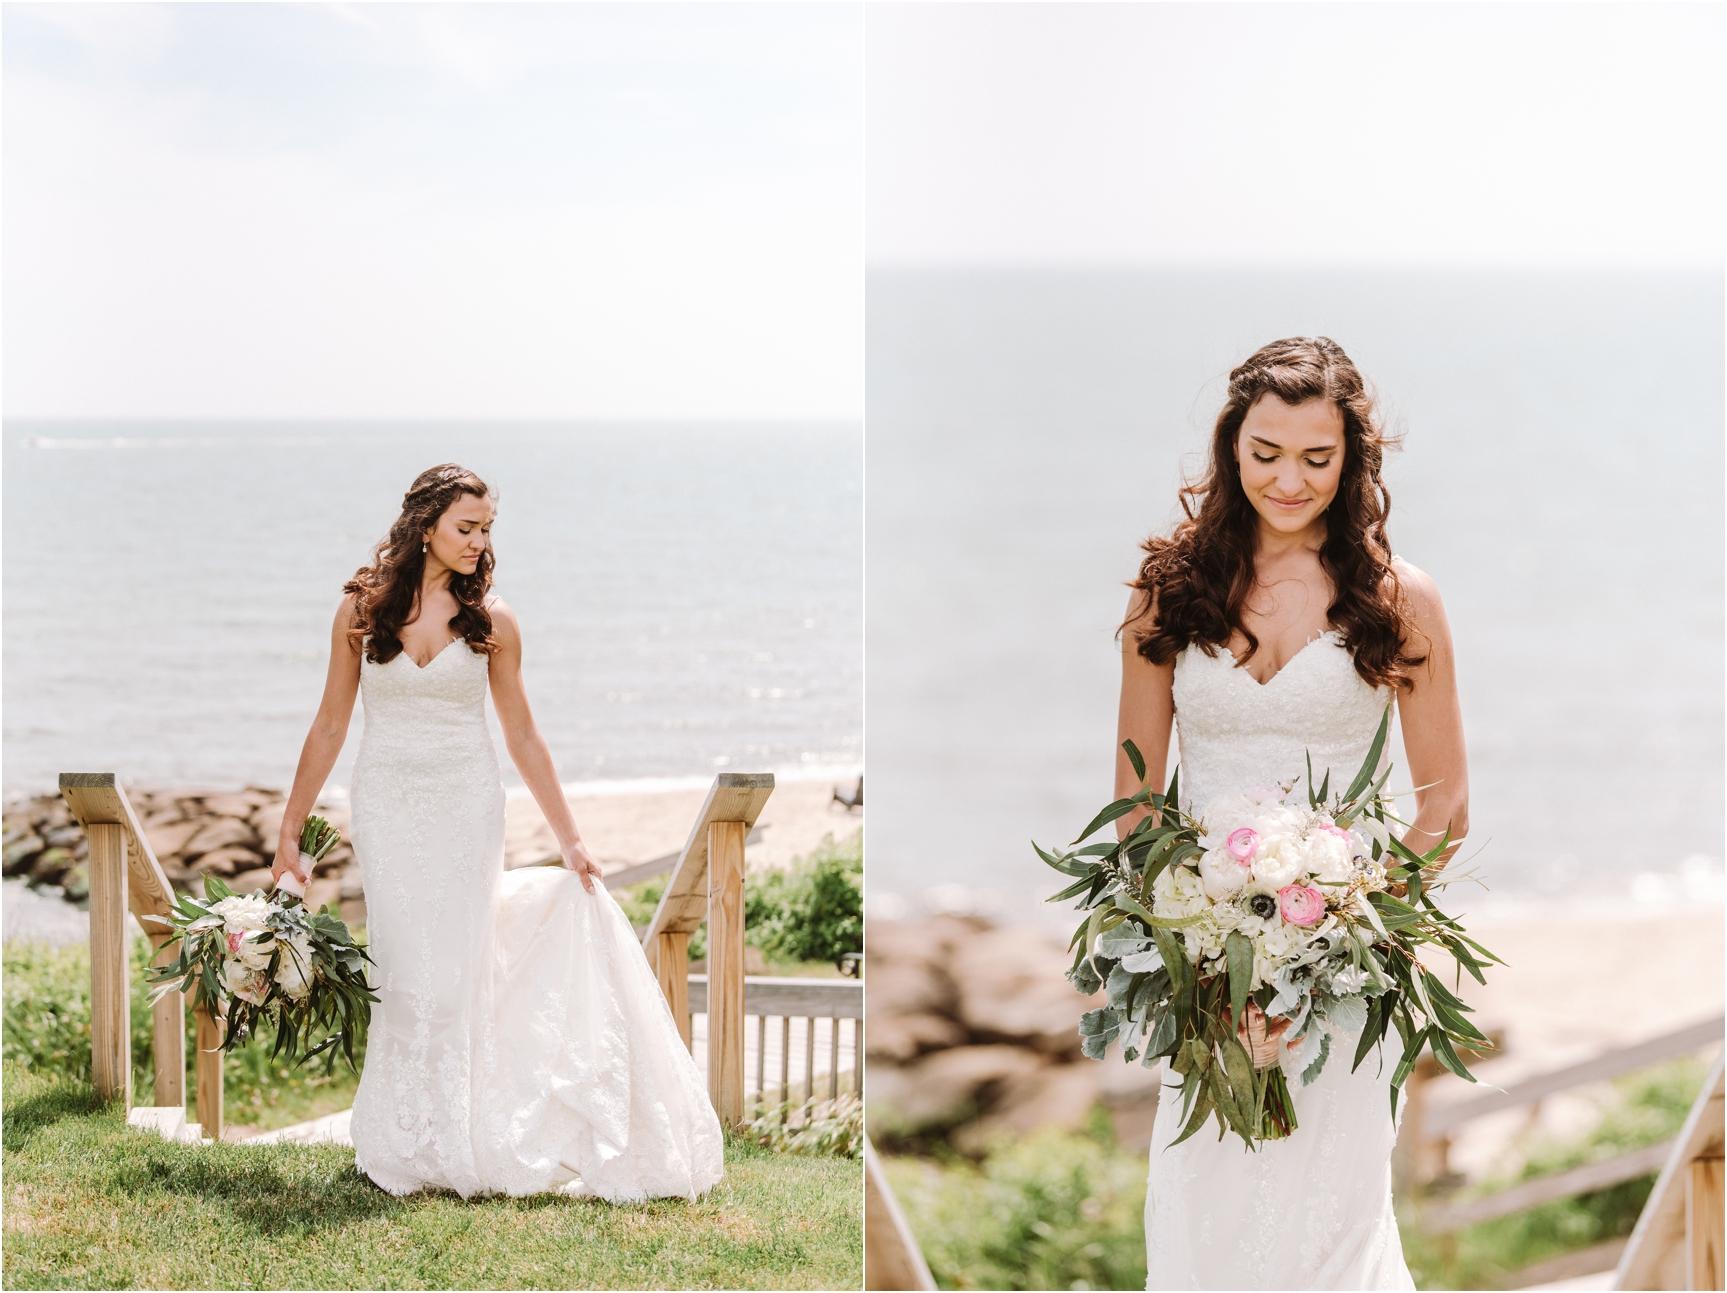 Sarah & Sam Pelham House Cape Cod Wedding Photographer-57.jpg